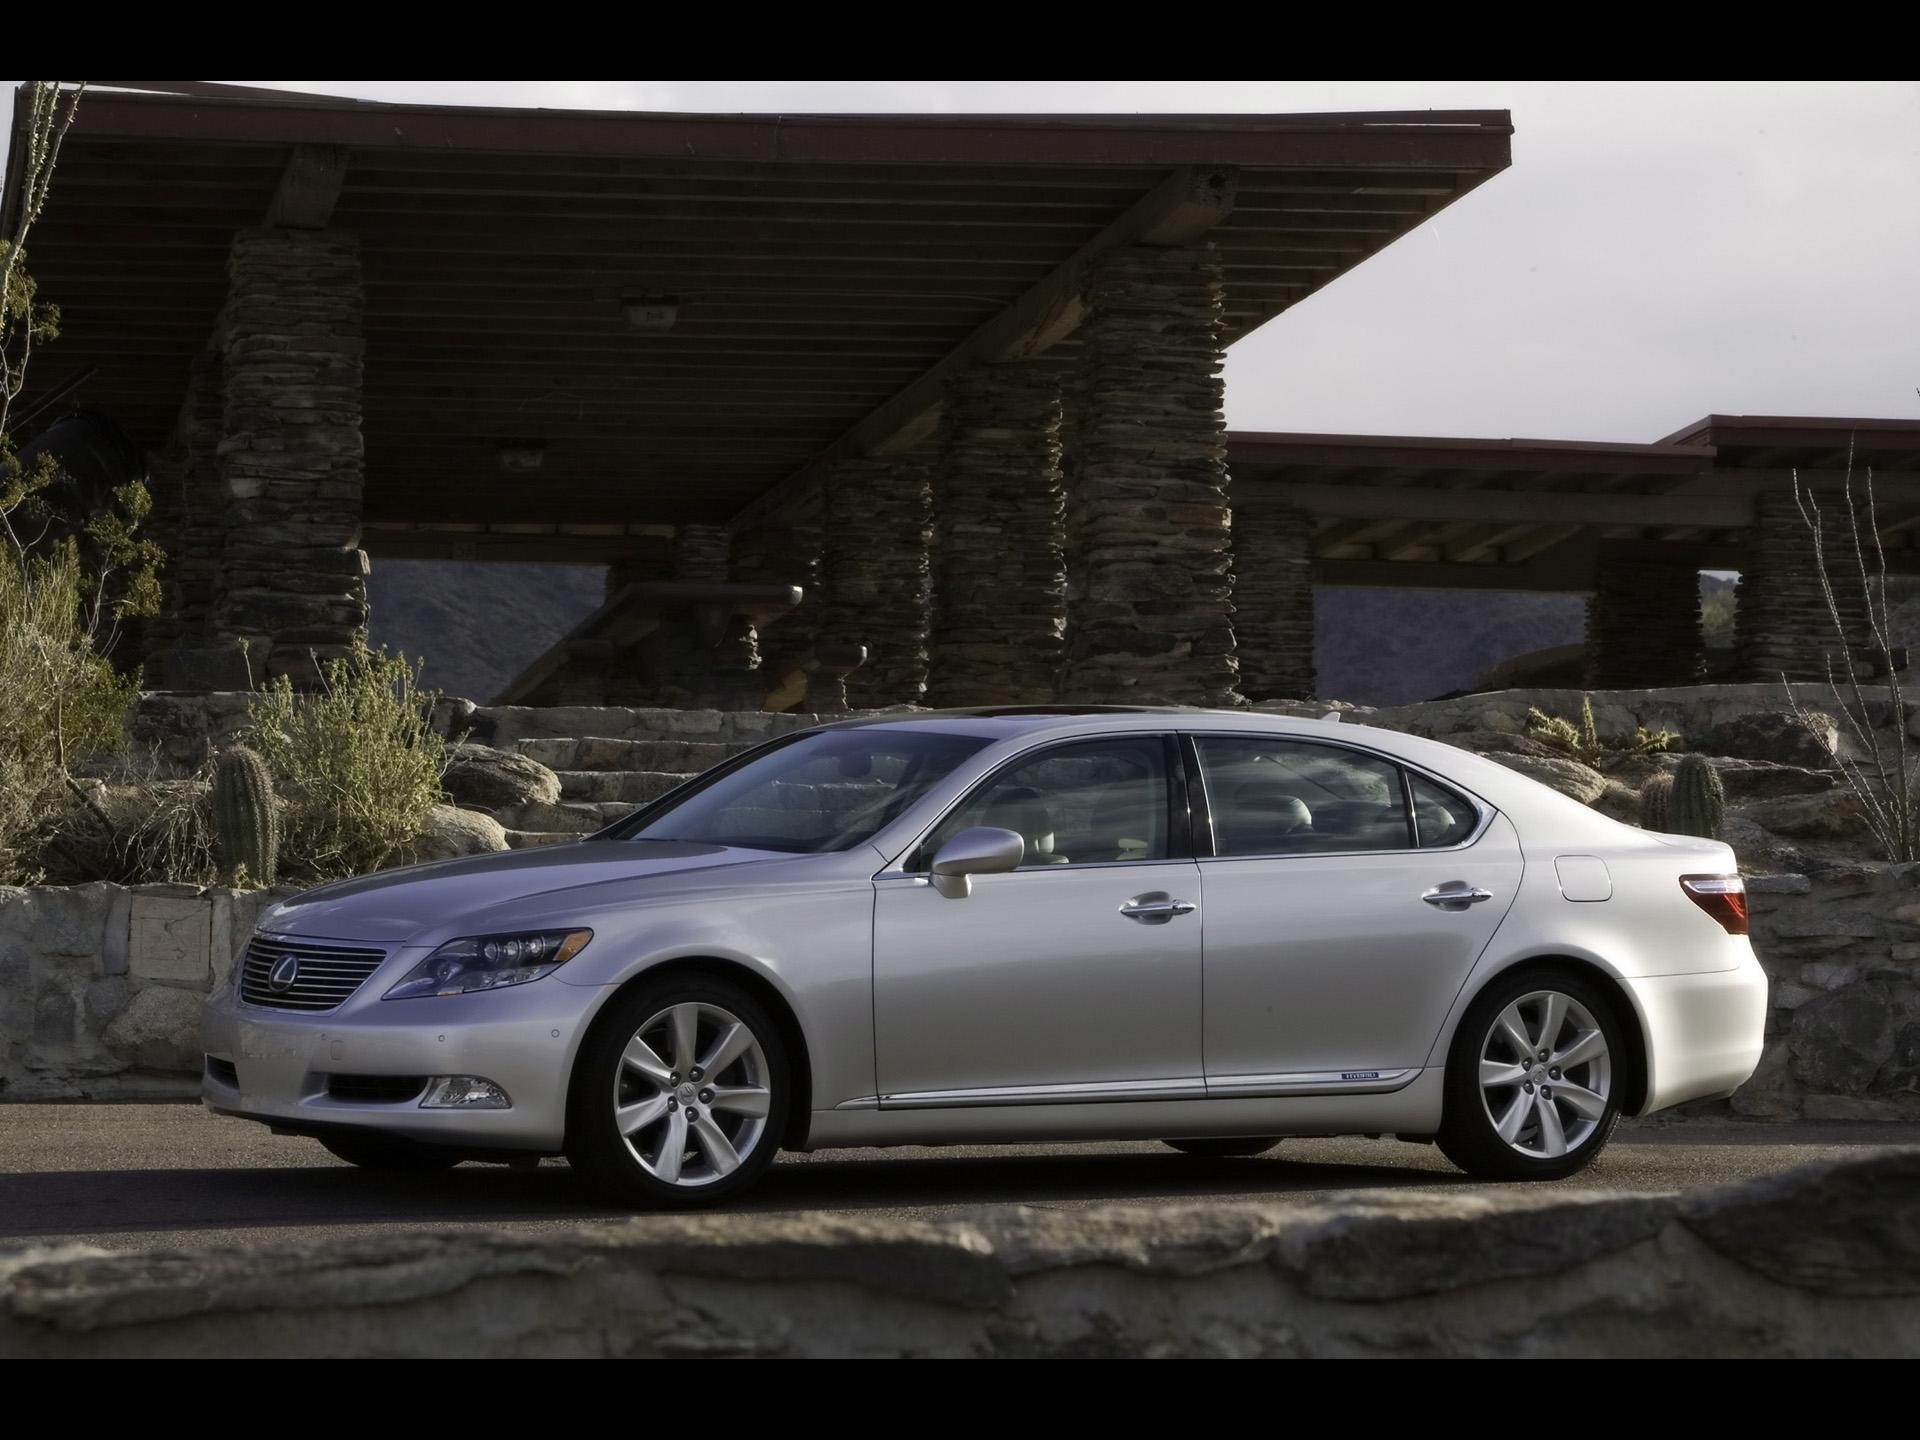 Lexus Ls600h L.Lexus LS600h Reviews: Research New Used Models Motor ...